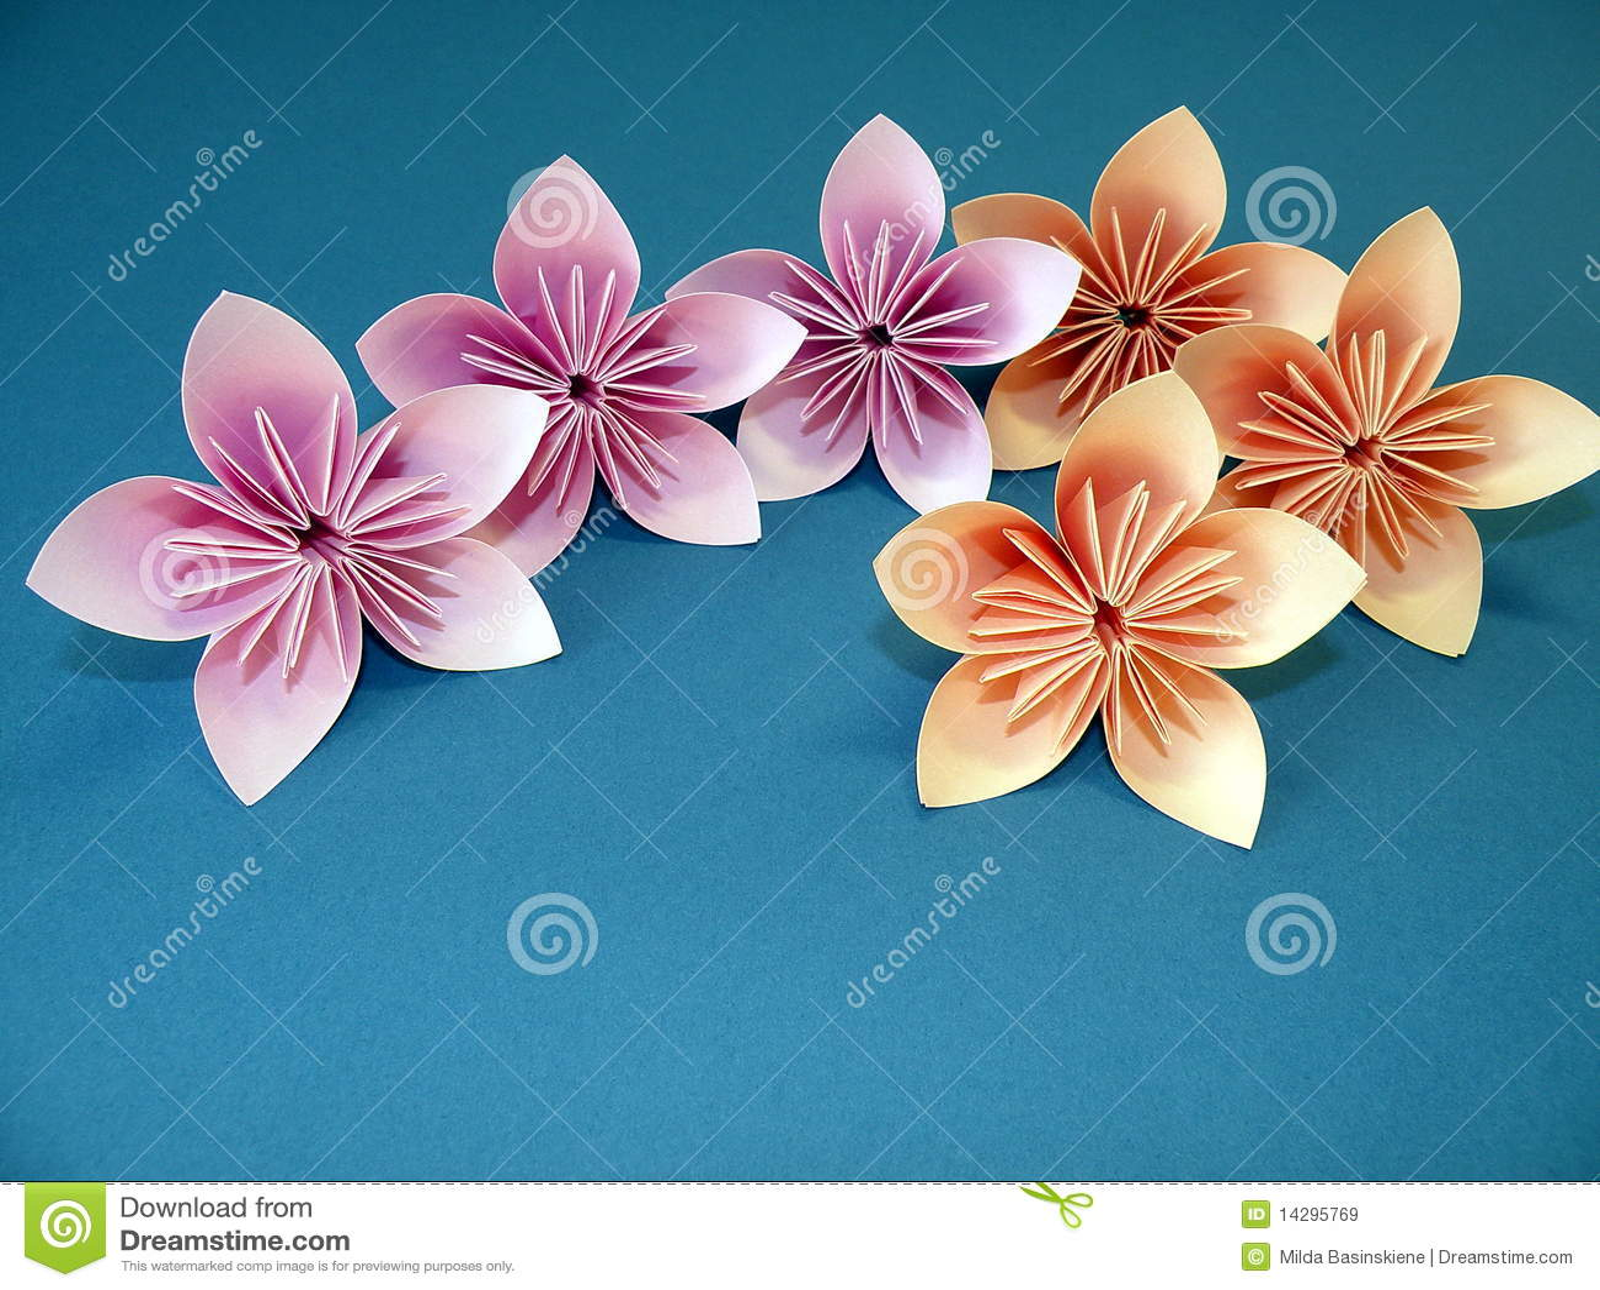 origami blume lizenzfreie stockbilder bild 14295769. Black Bedroom Furniture Sets. Home Design Ideas